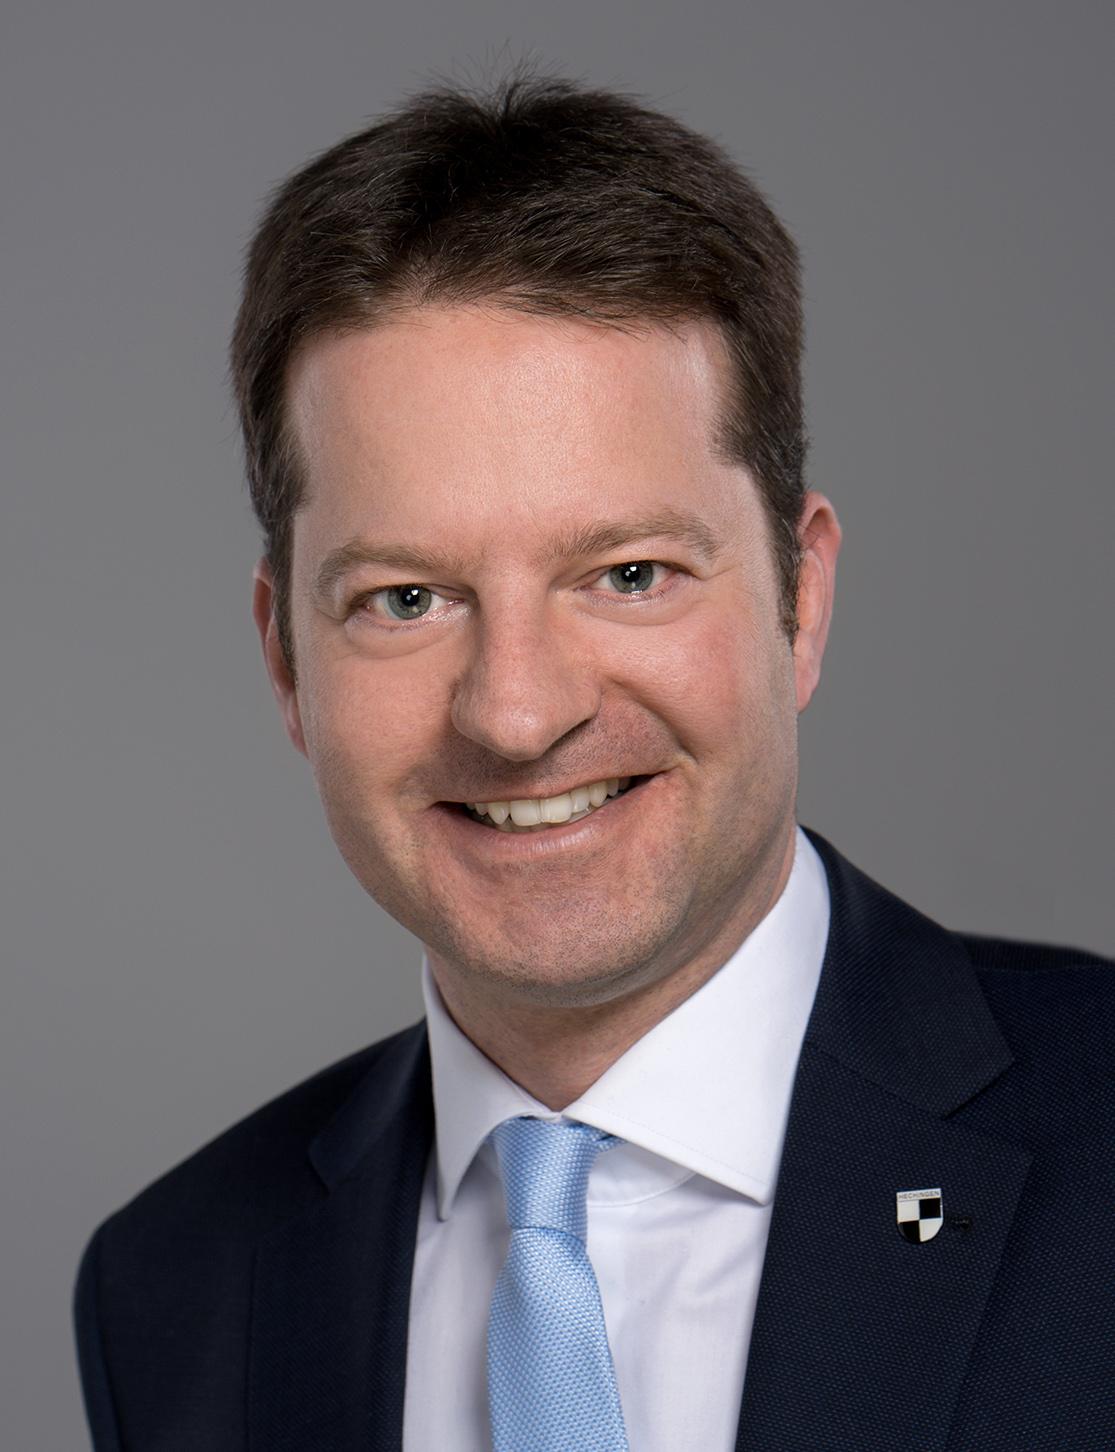 Bürgermeister Philipp Hahn